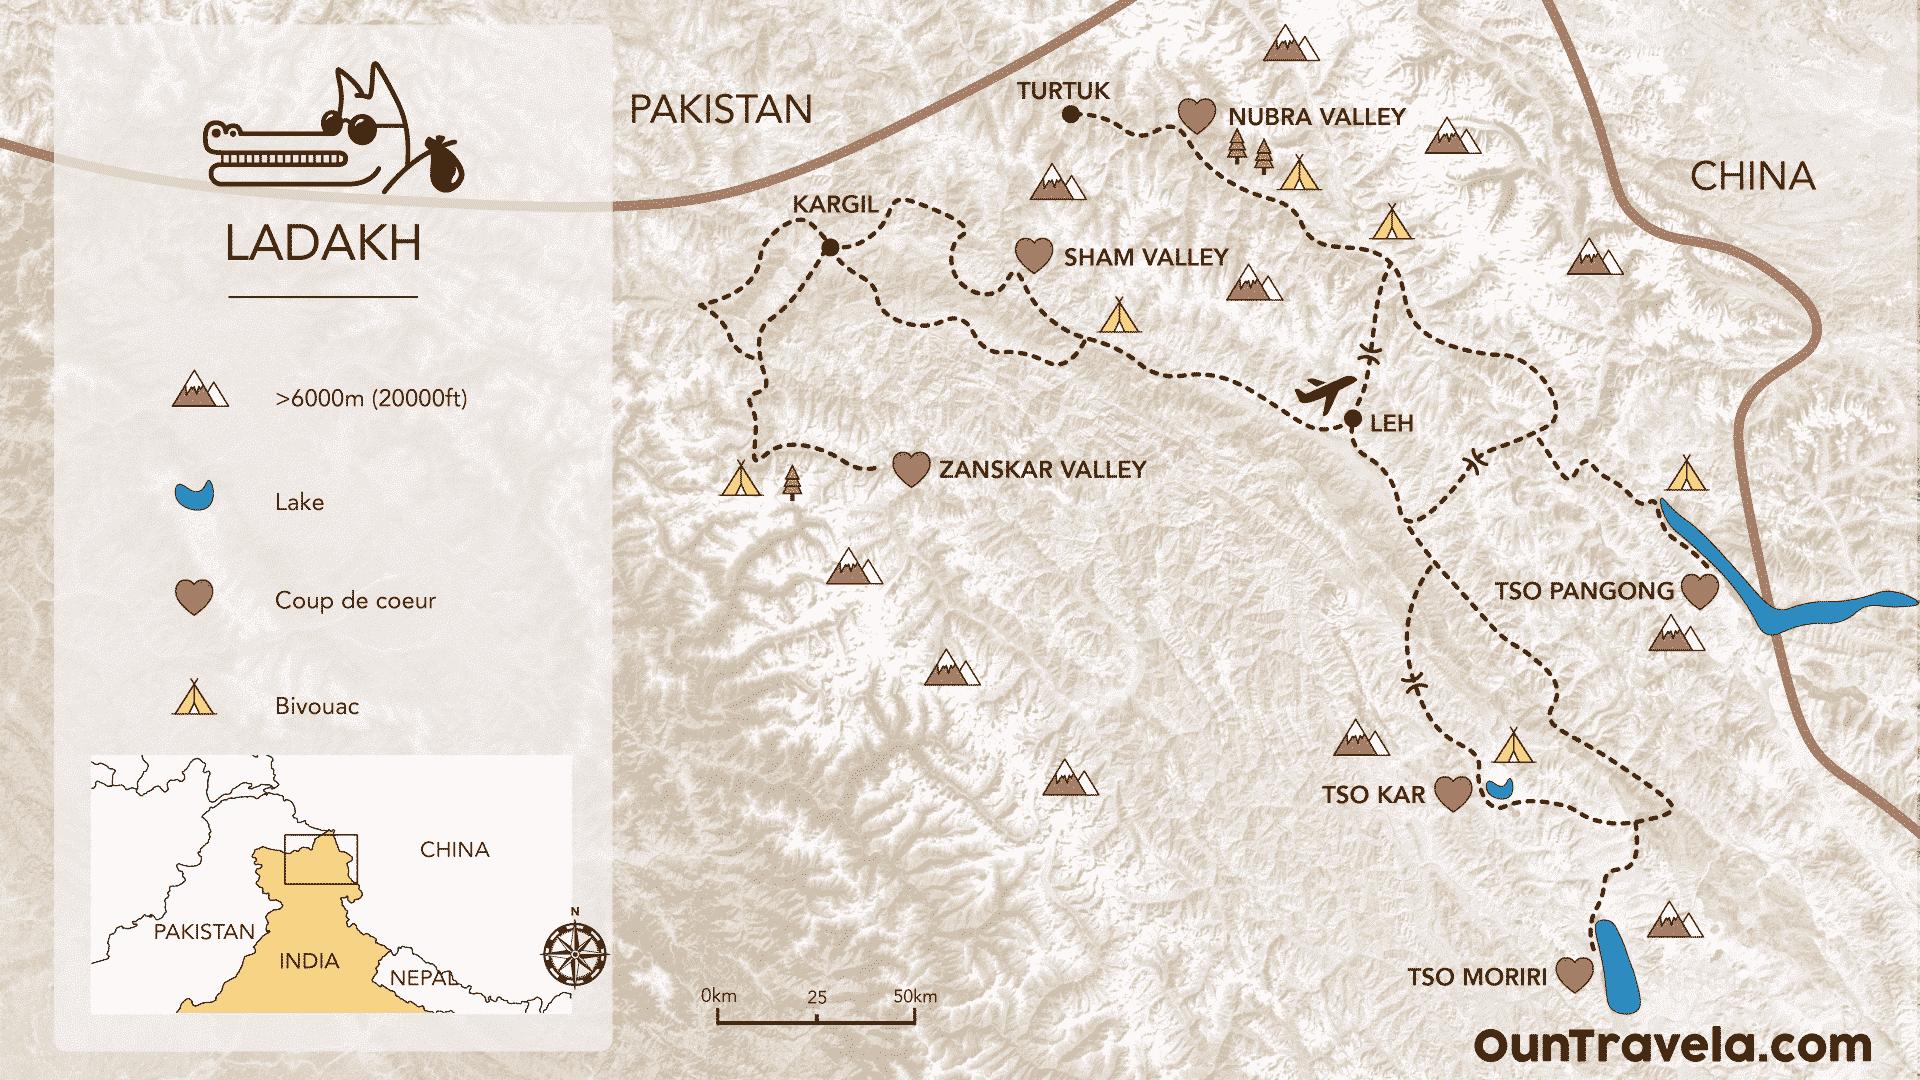 Map Ladakh india moto Royal Enfield : zanskar nubra pangong moriri